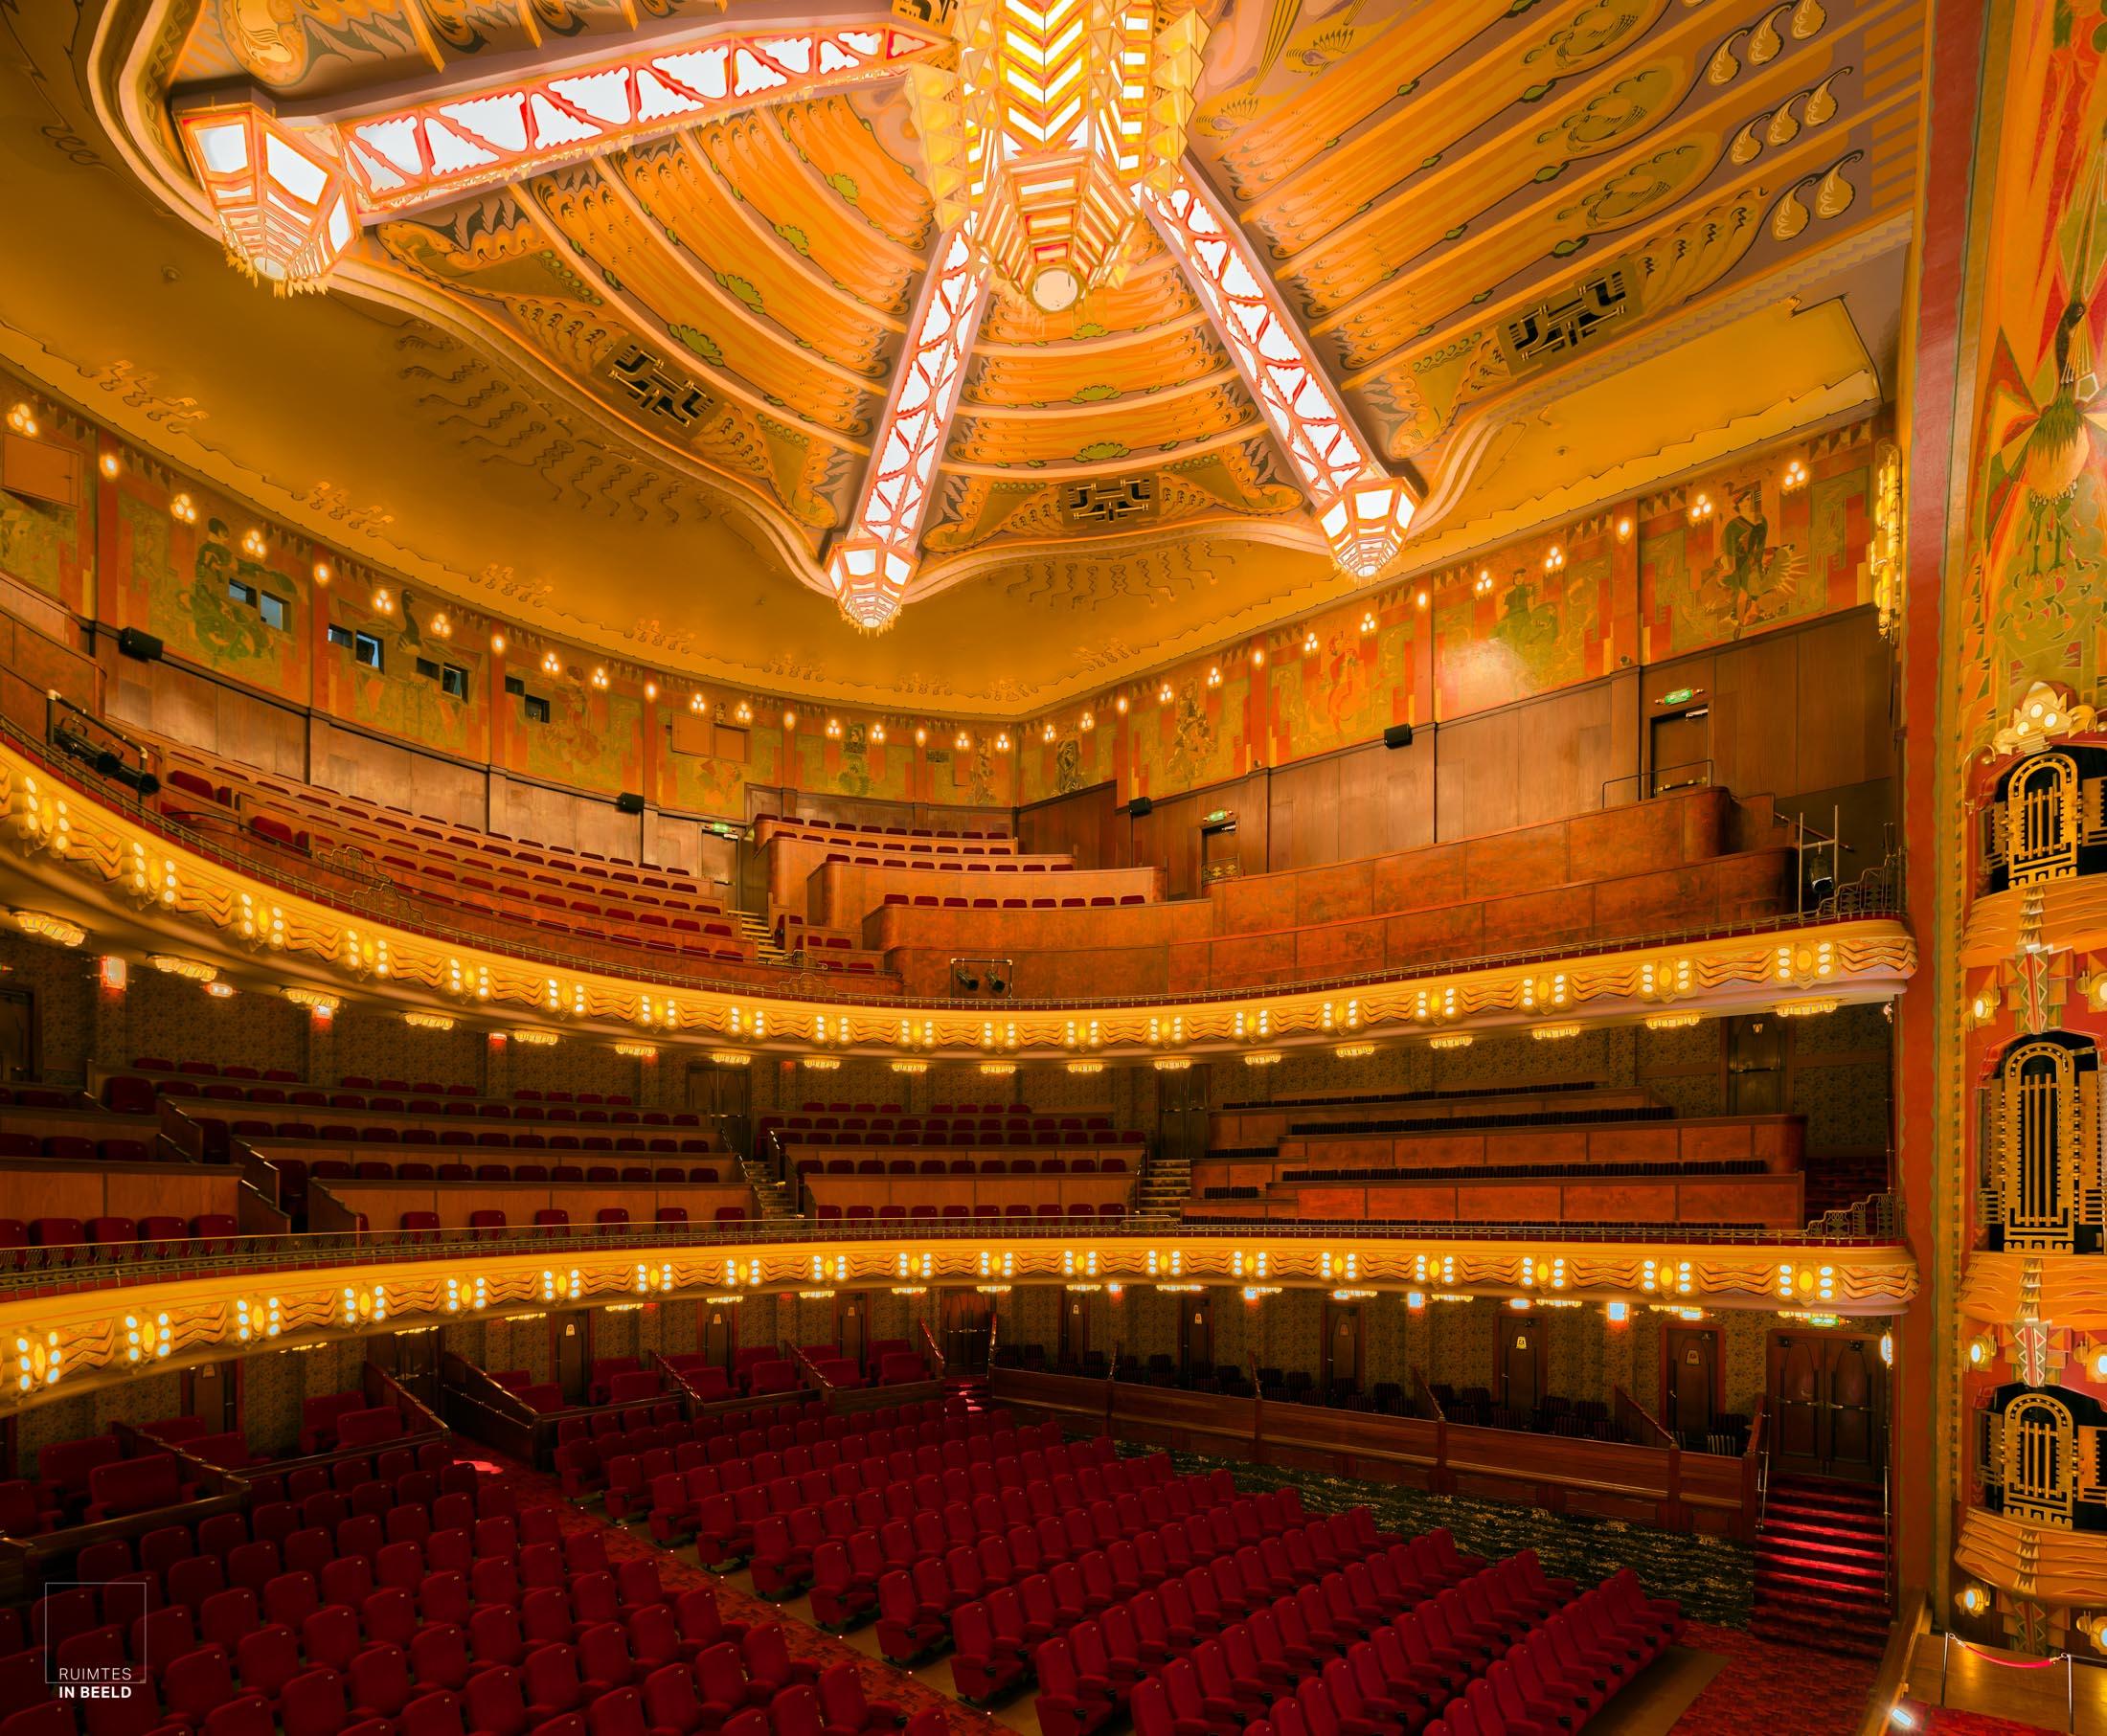 Grote zaal in het Tuschinski theater in Amsterdam   Amsterdam Tuschinski theater main hall